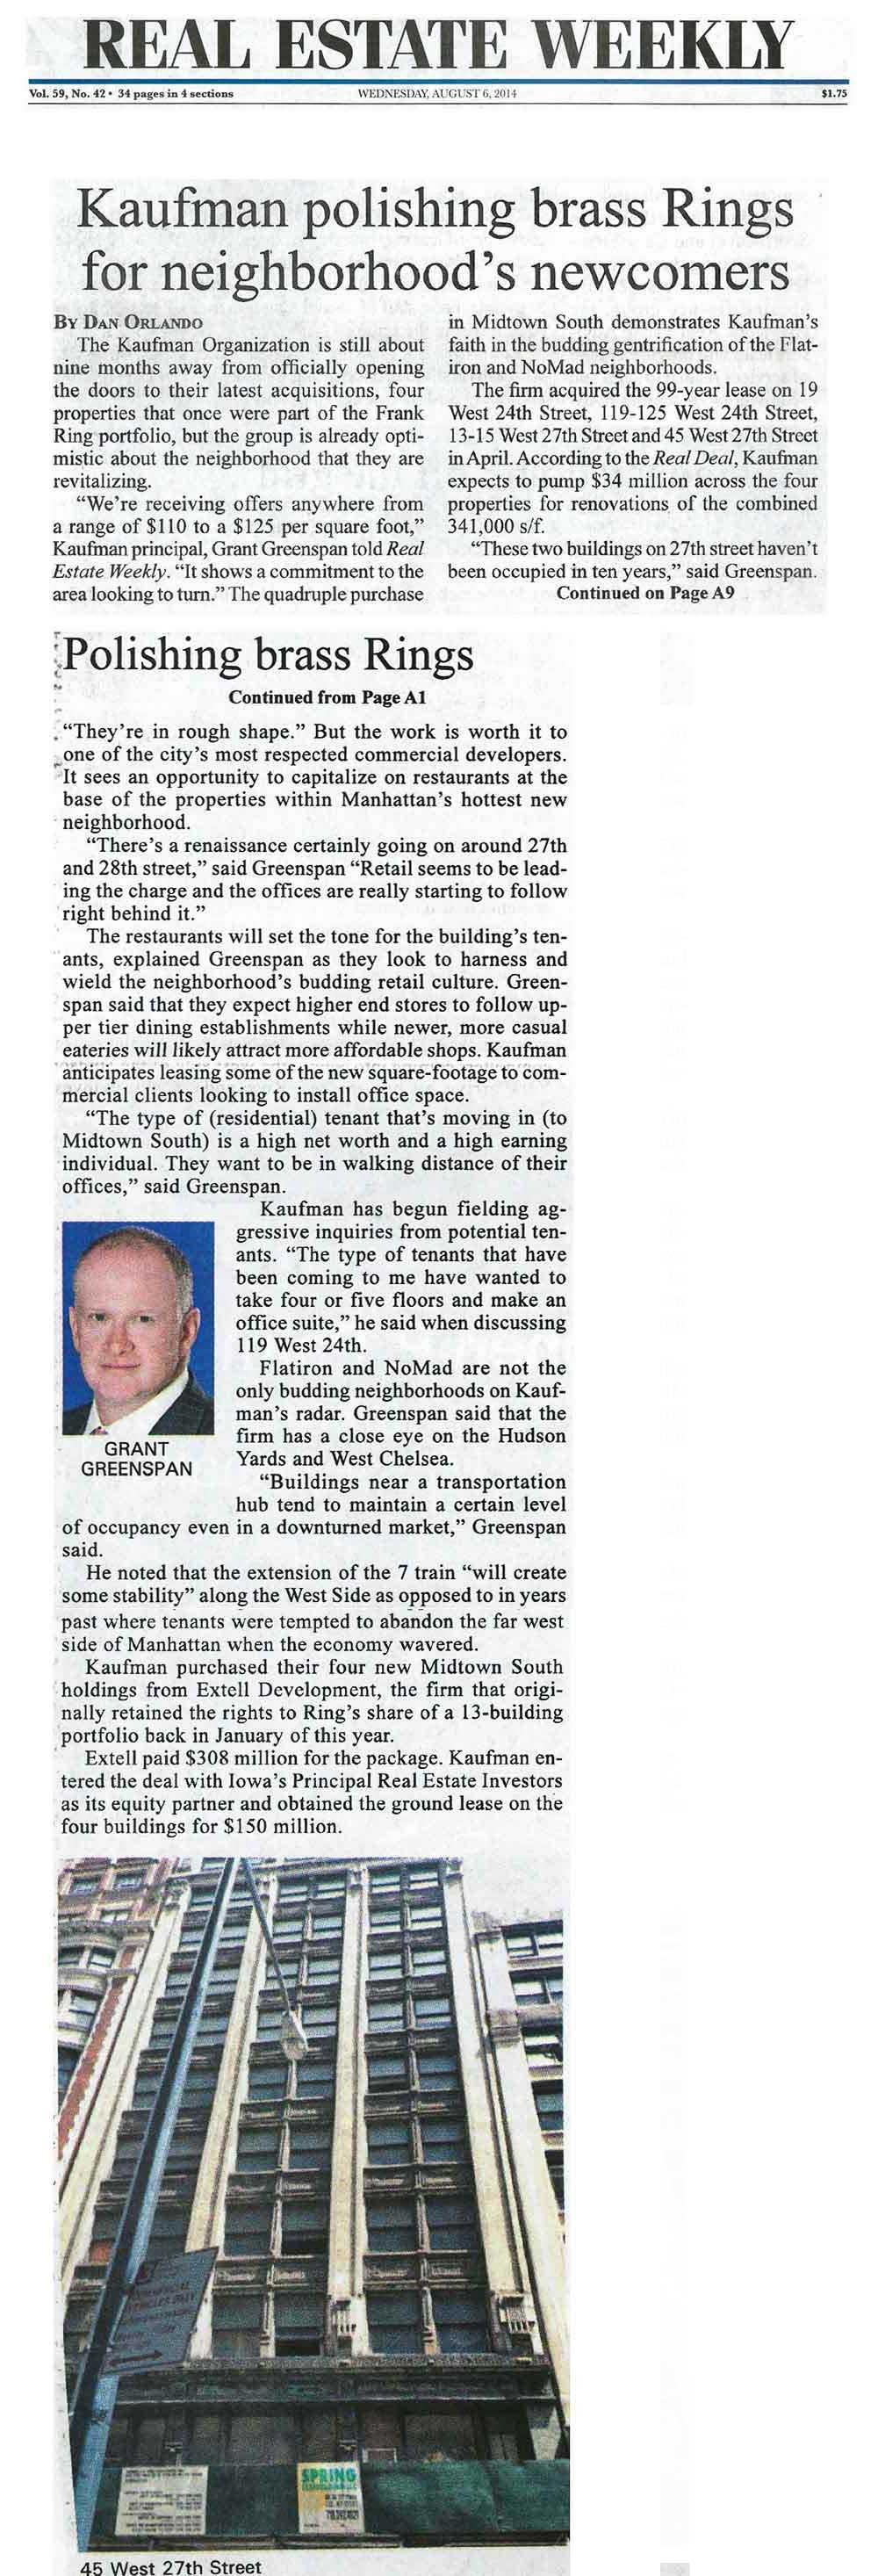 Real-Estate-Weekly---Kaufman-polishing-brass-Rings-for-neighborhood's-newcomers---8.6.14